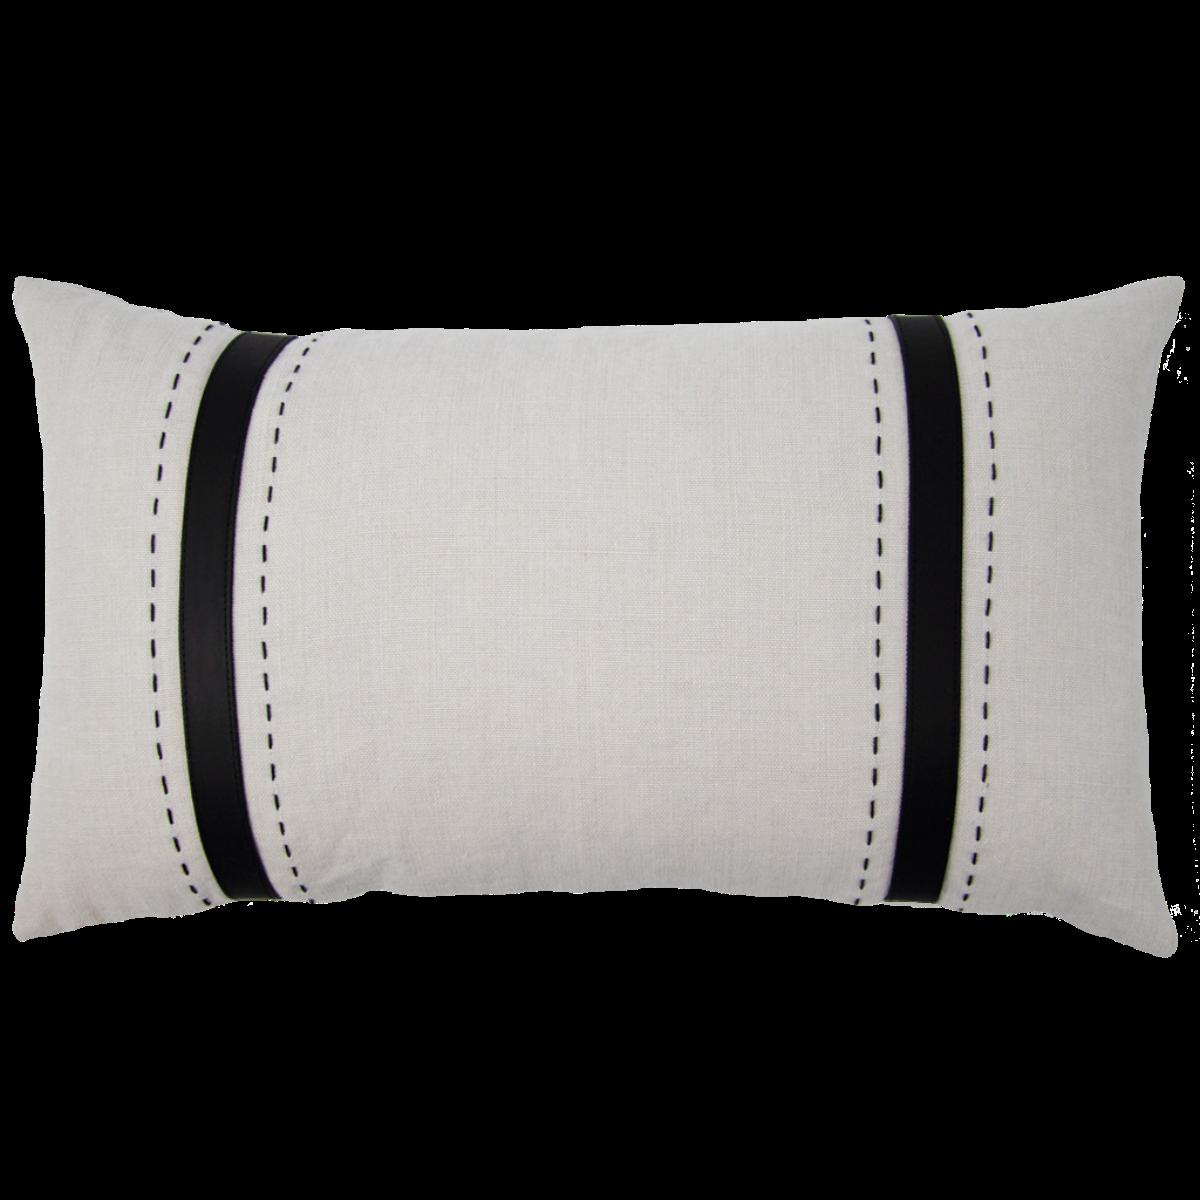 de Le Cuona   Bracken Cushion With Leather Straps Mushroom